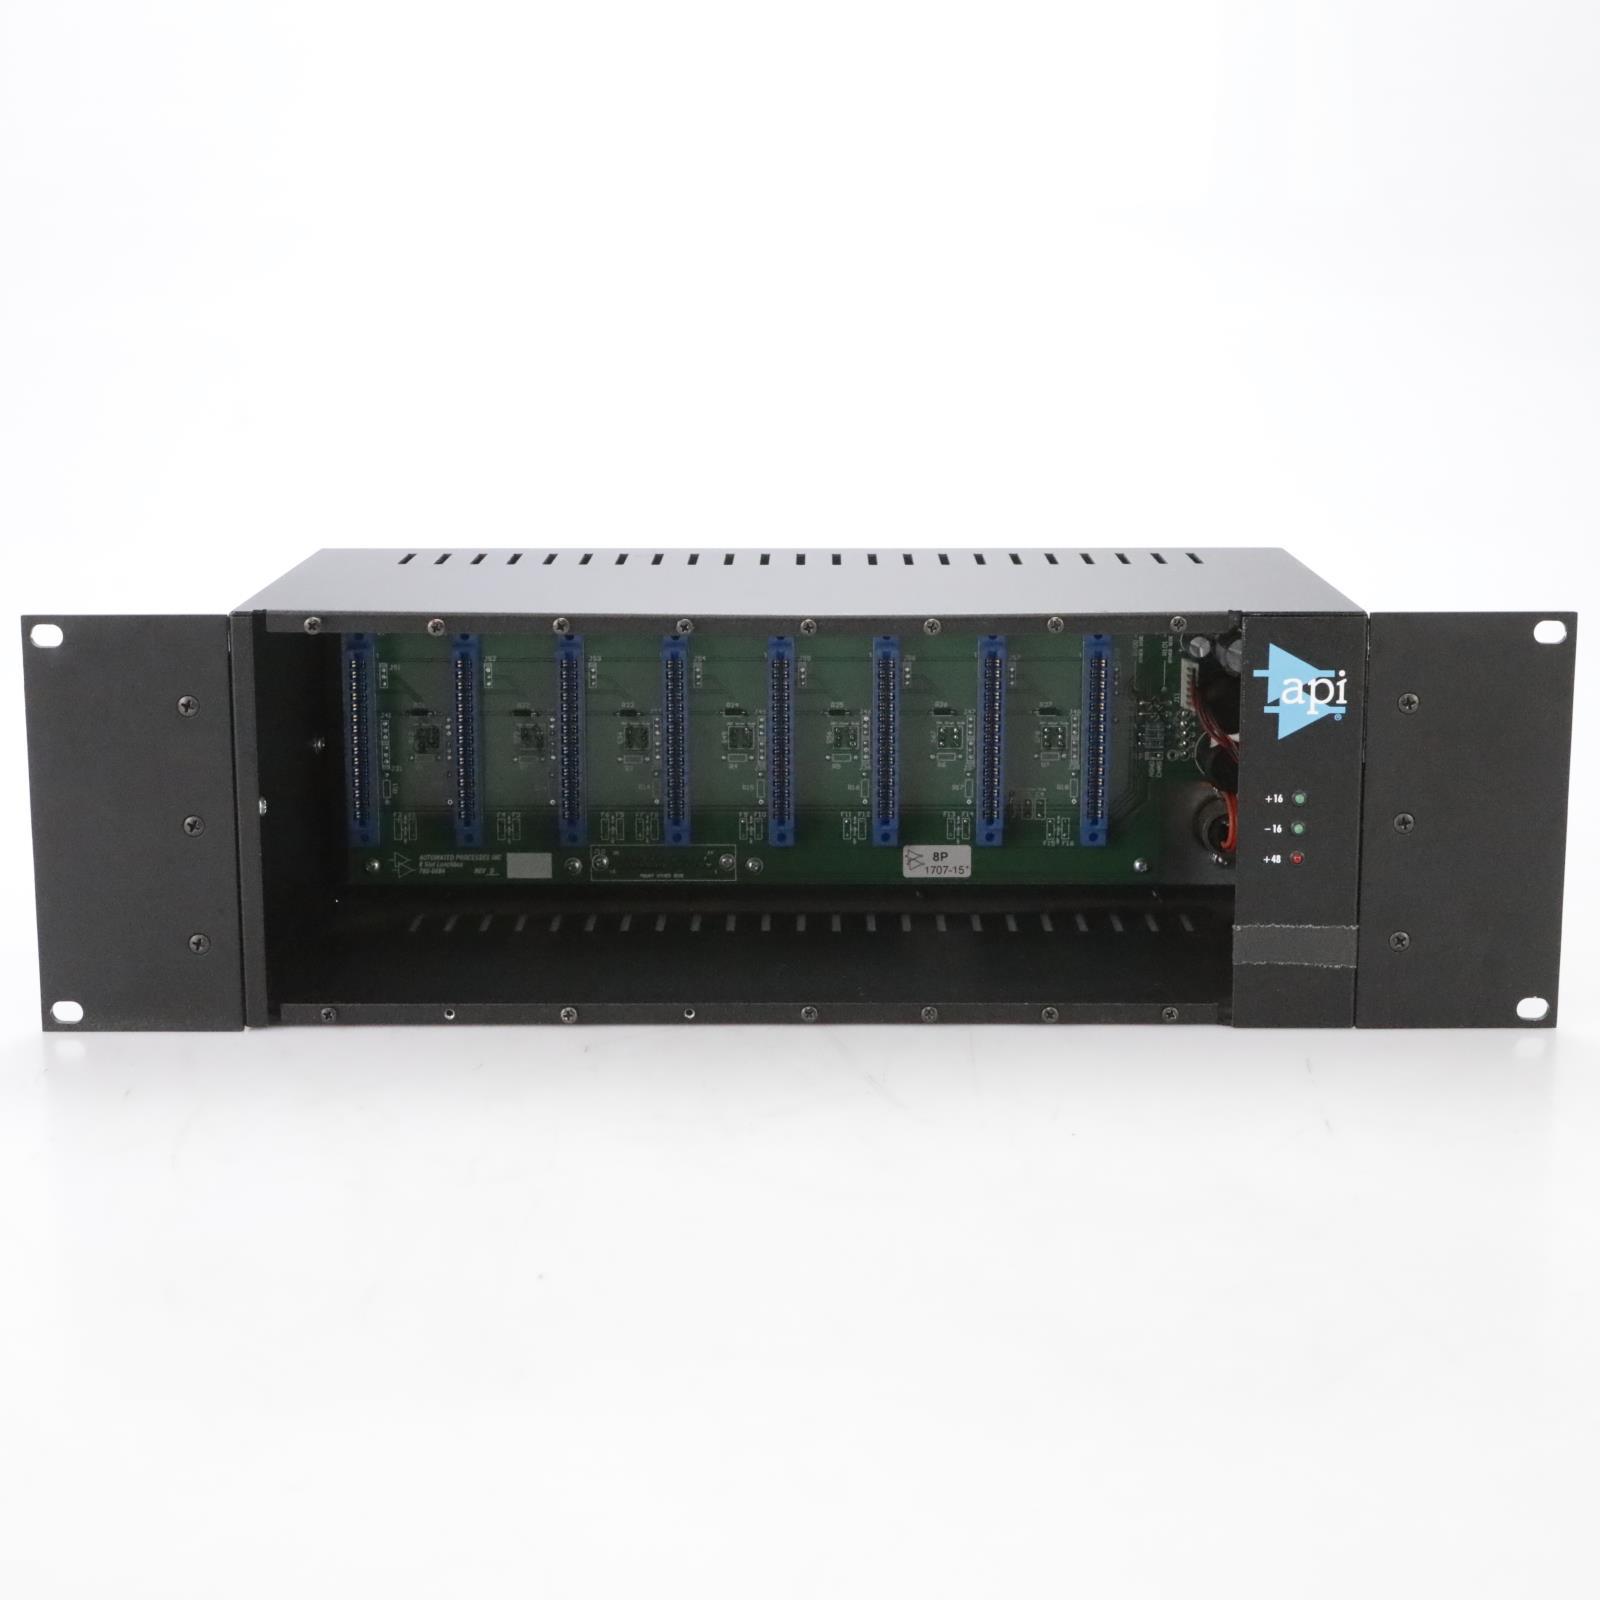 API 500-8 8-Slot 500 Series Lunchbox w/ Power Supply #44848